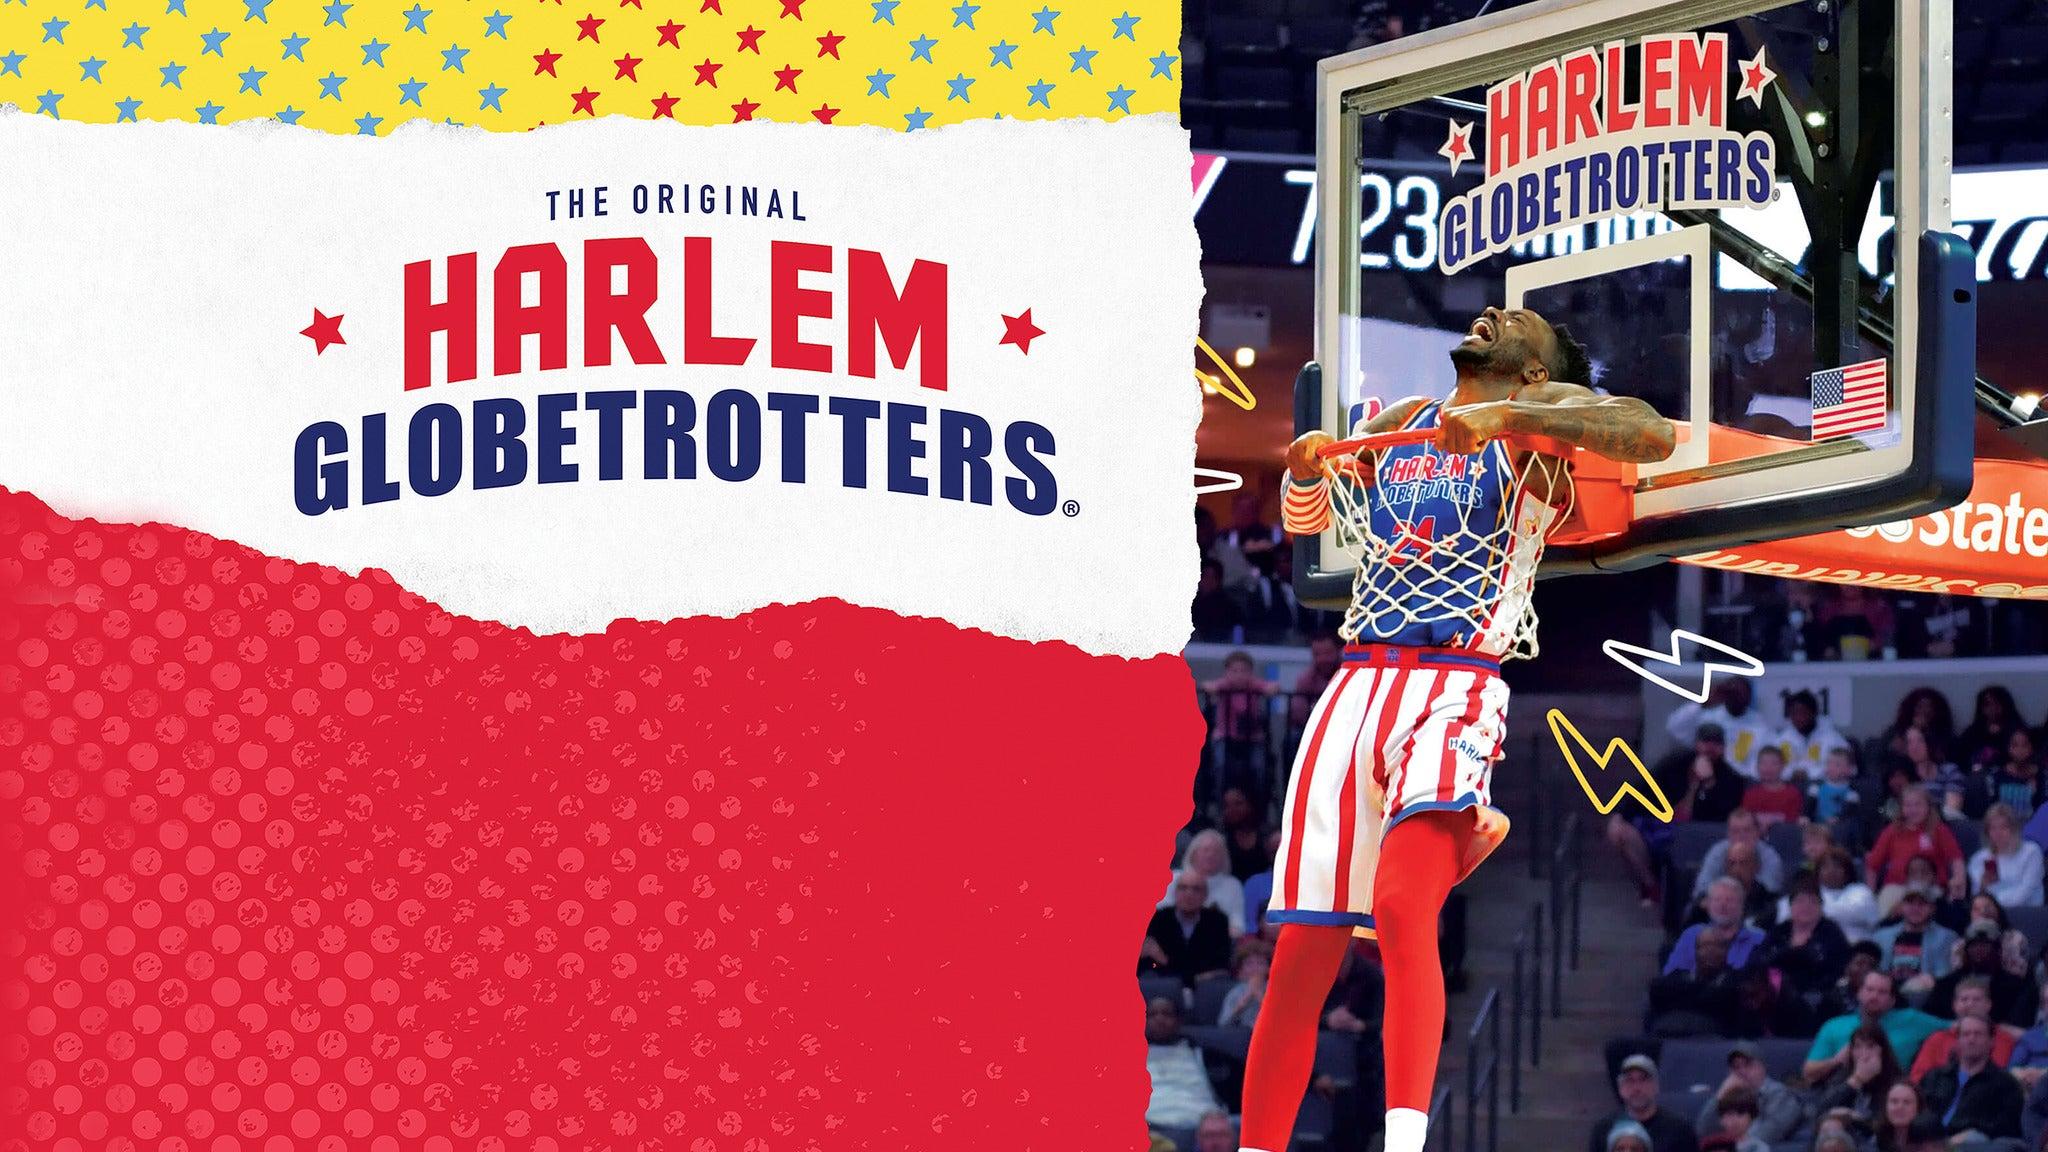 The Original Harlem Globetrotters Event Title Pic